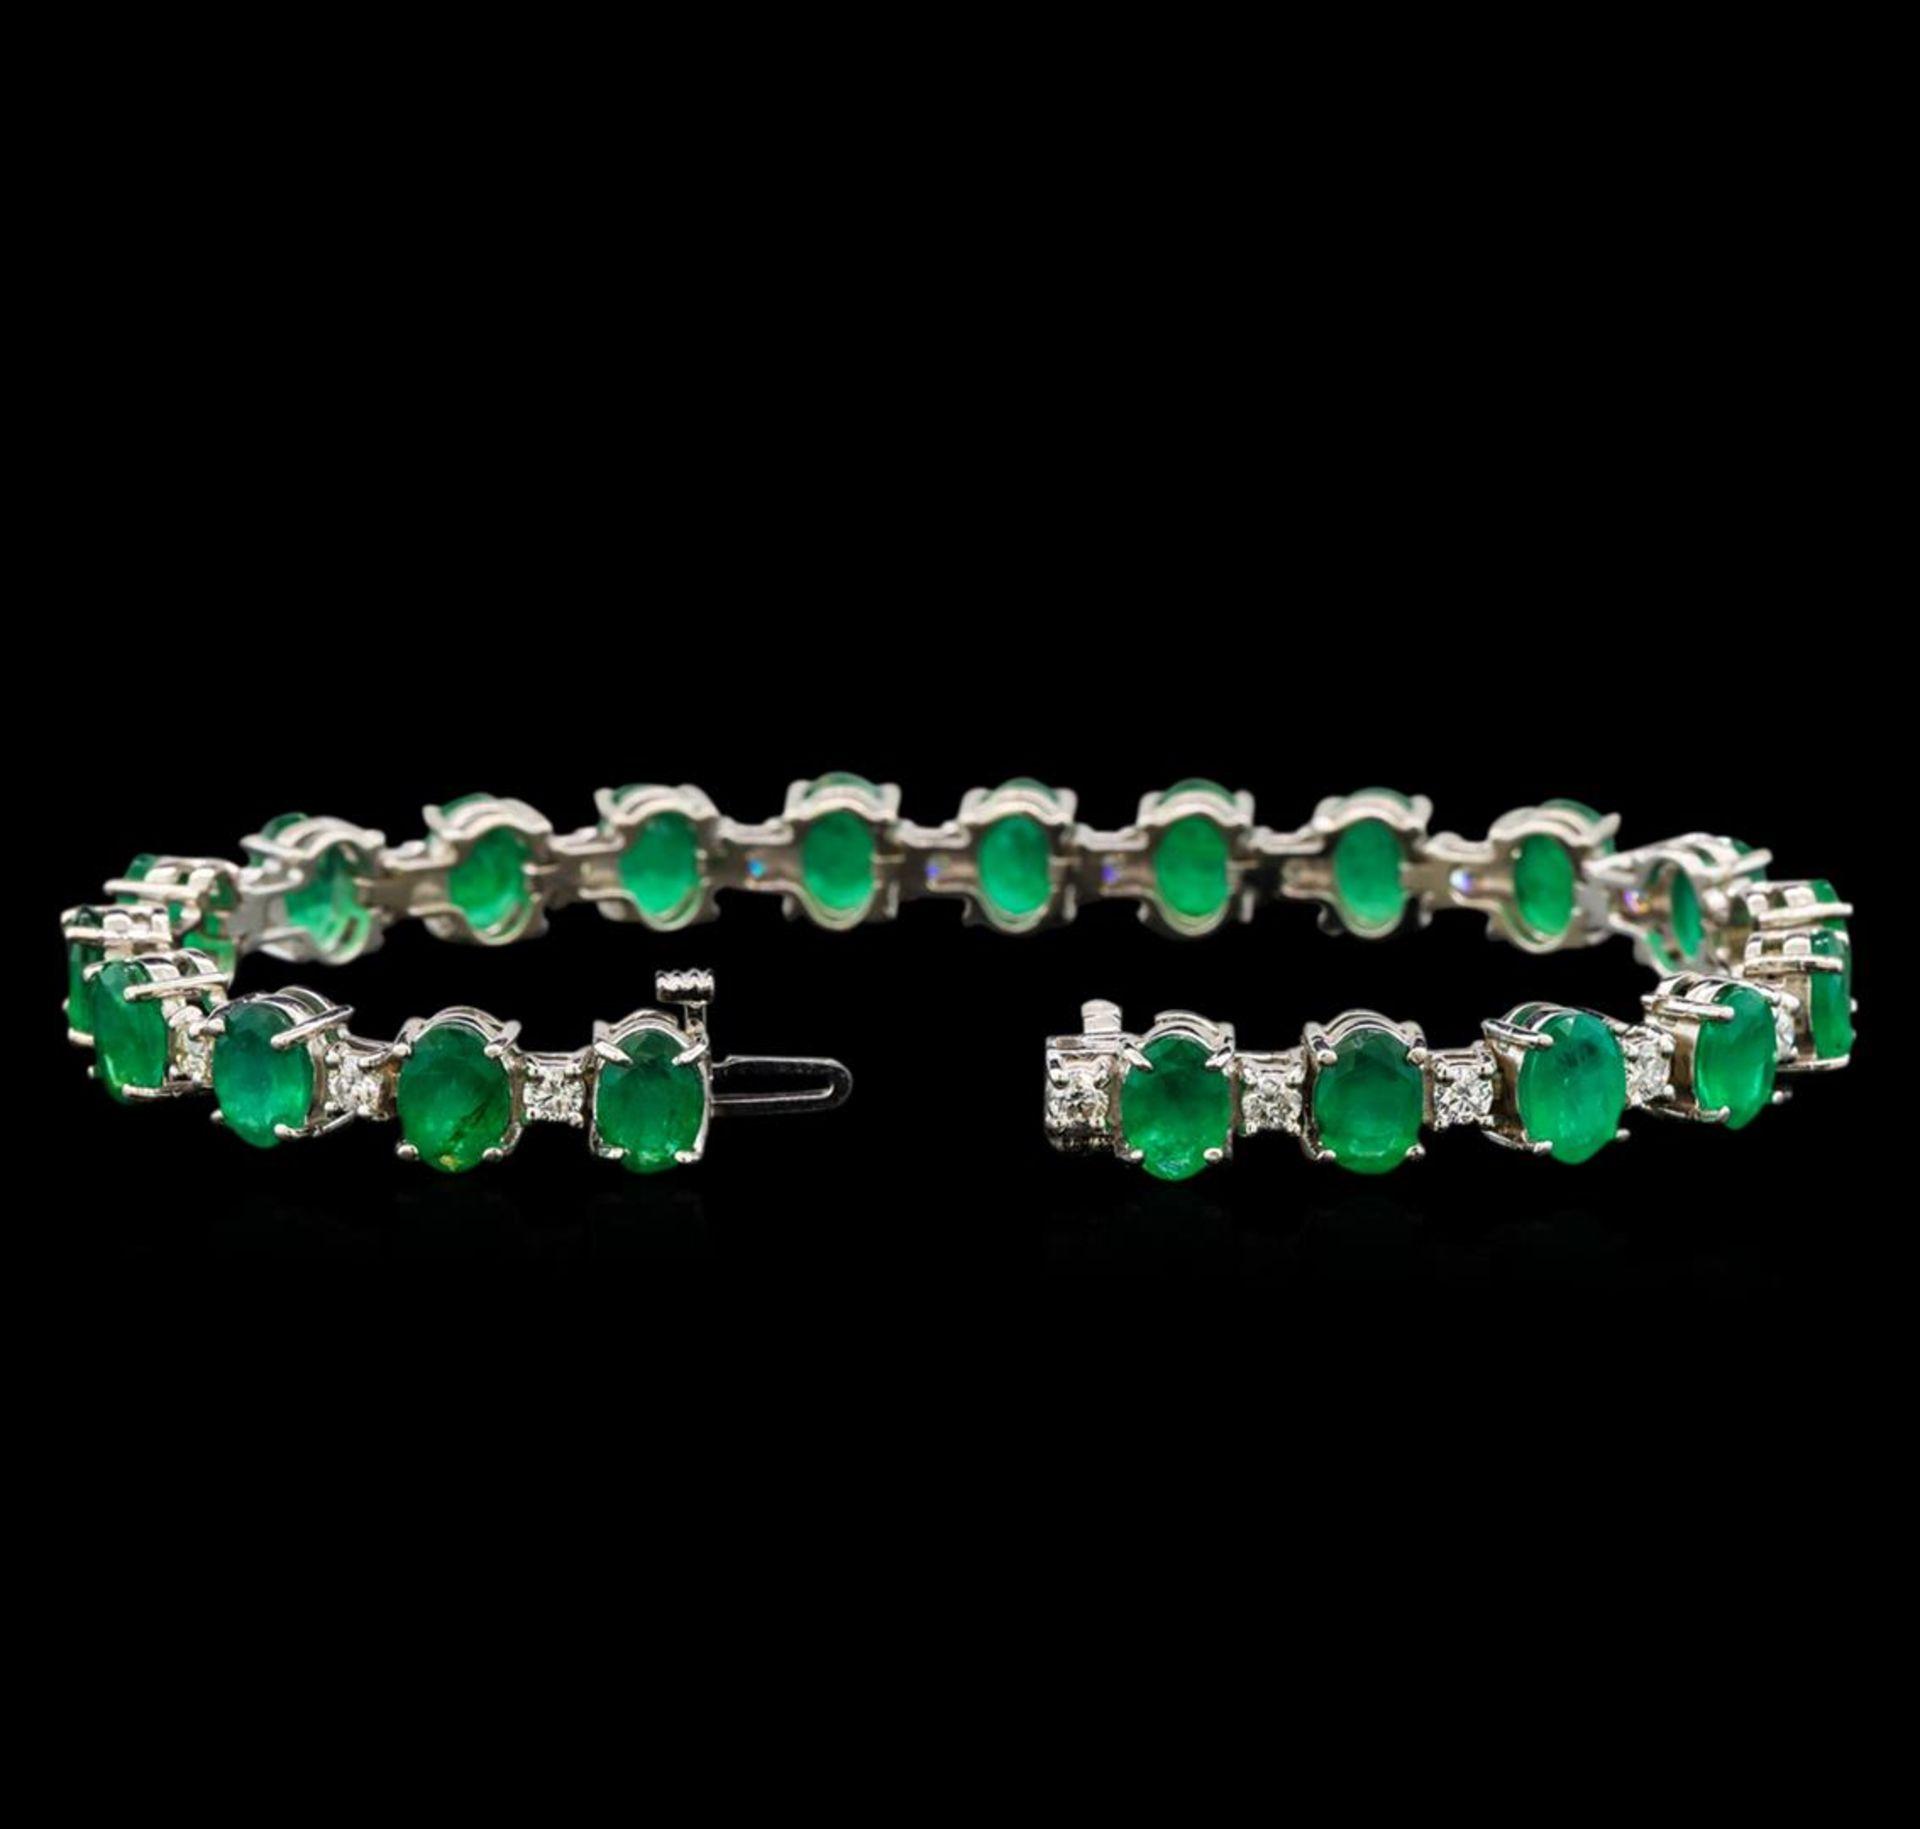 14KT White Gold 15.83 ctw Emerald and Diamond Bracelet - Image 3 of 4